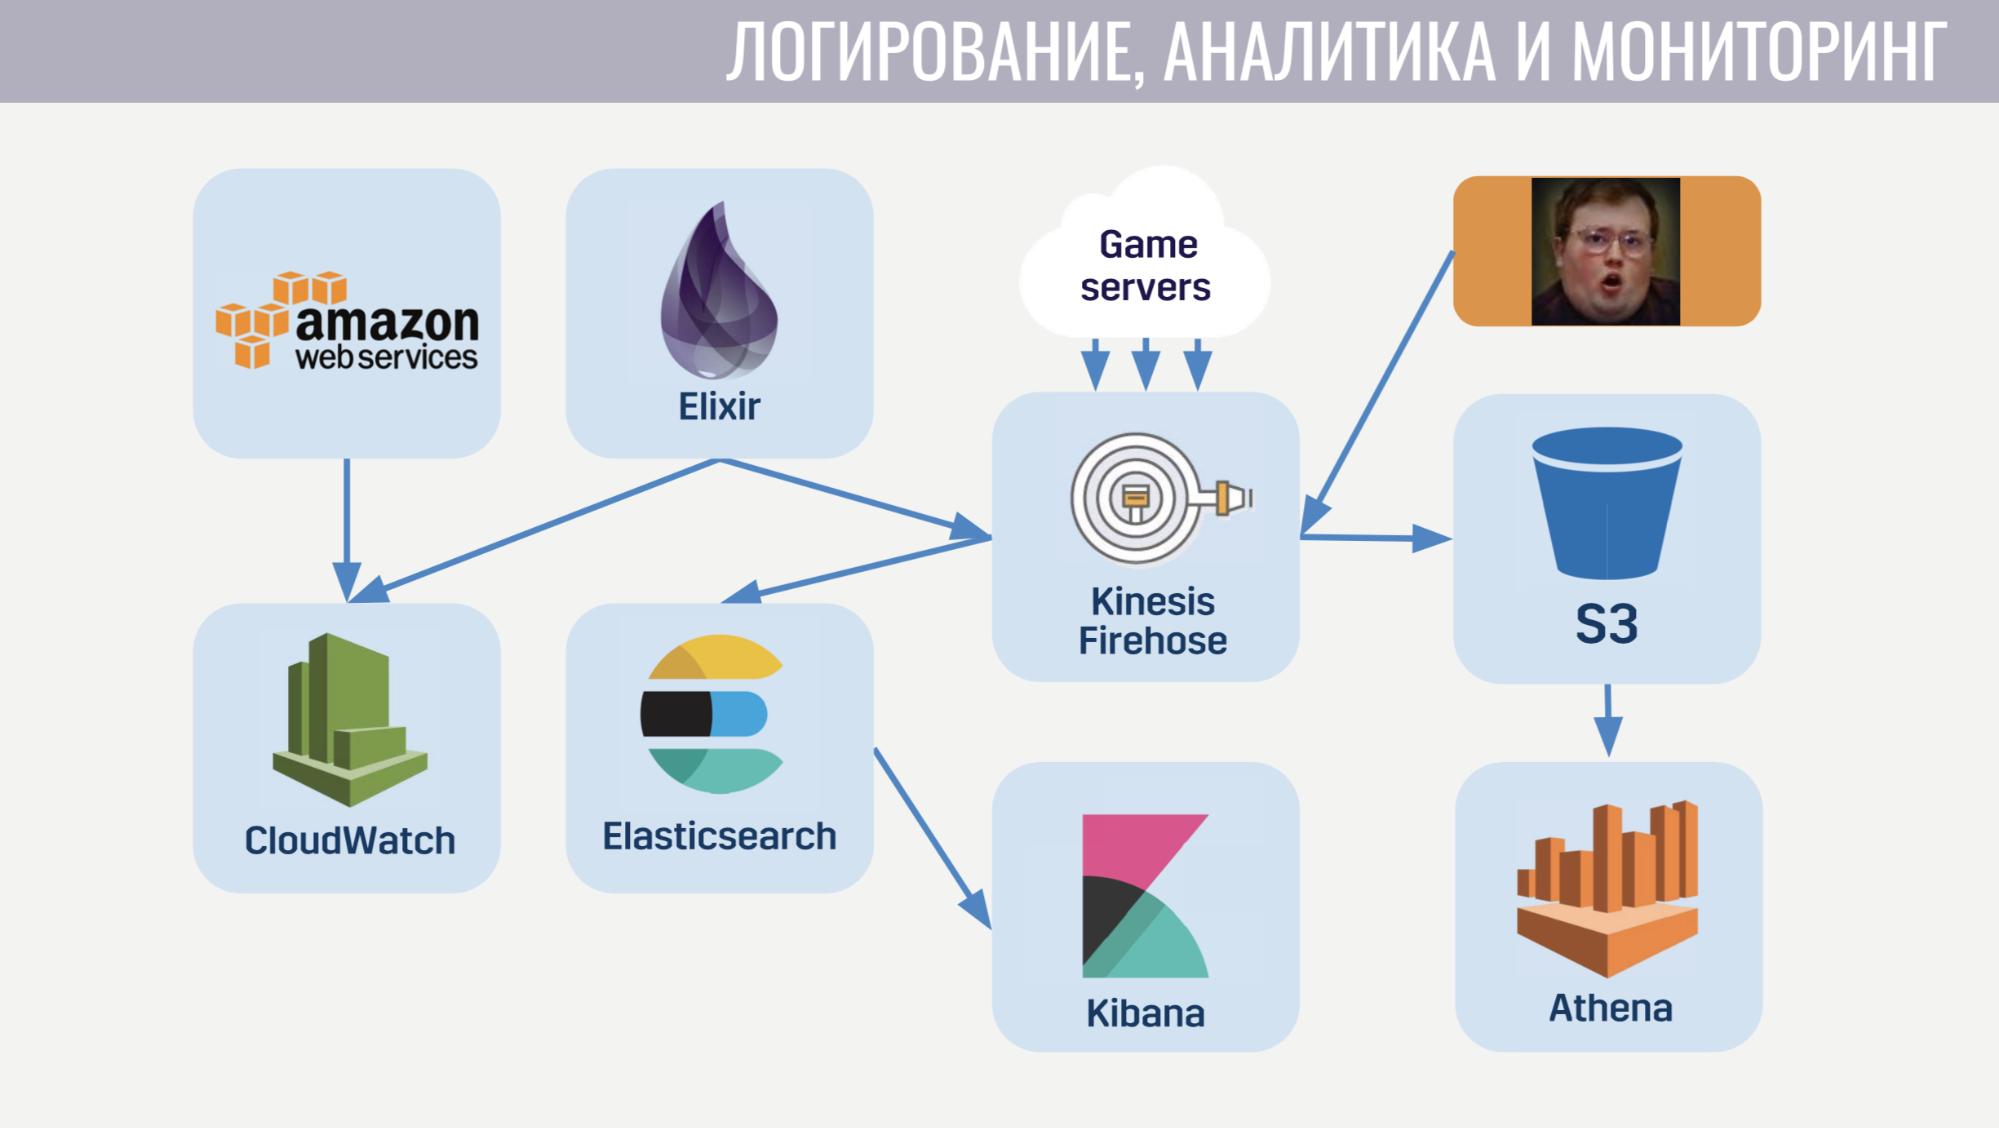 Архитектура мета-сервера мобильного онлайн-шутера Tacticool - 14